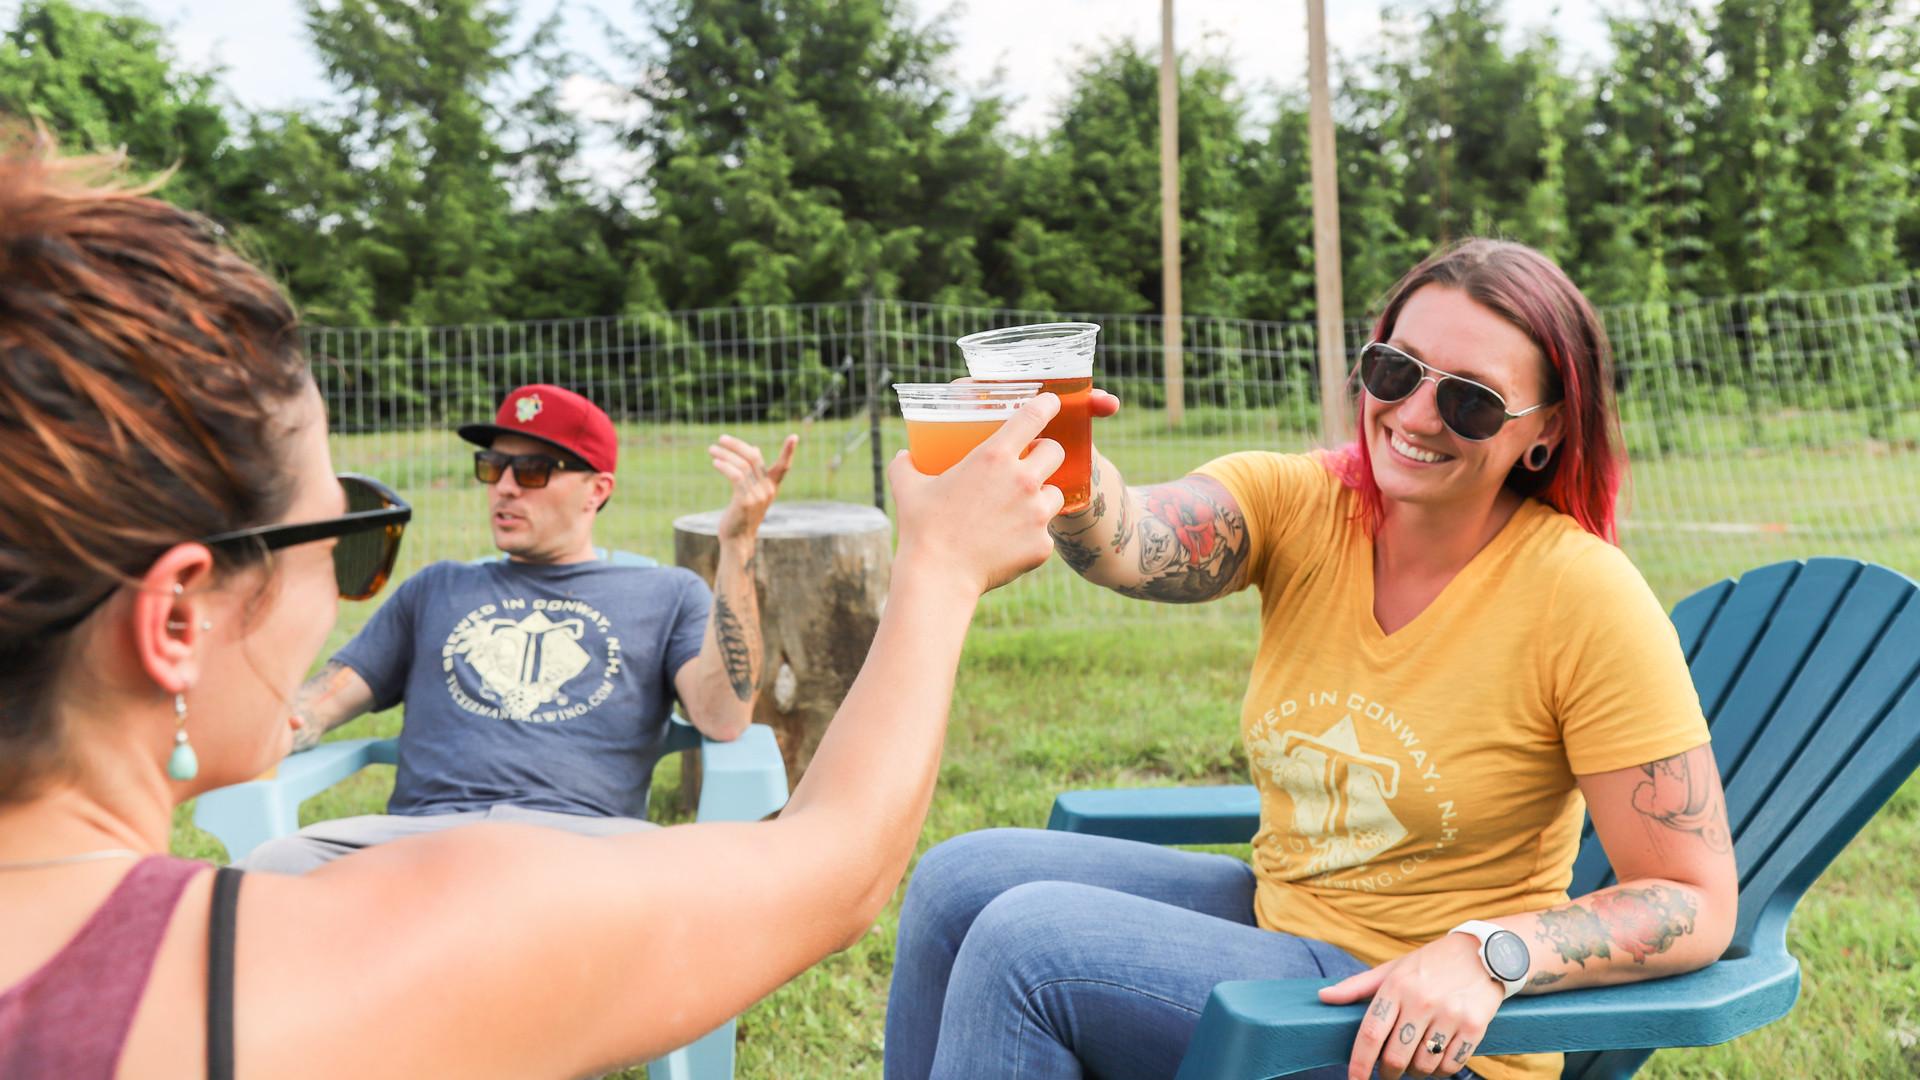 New Hampshire restaurants and activities | The outdoor beer garden at Tuckerman Brewing in Conway New Hampshire